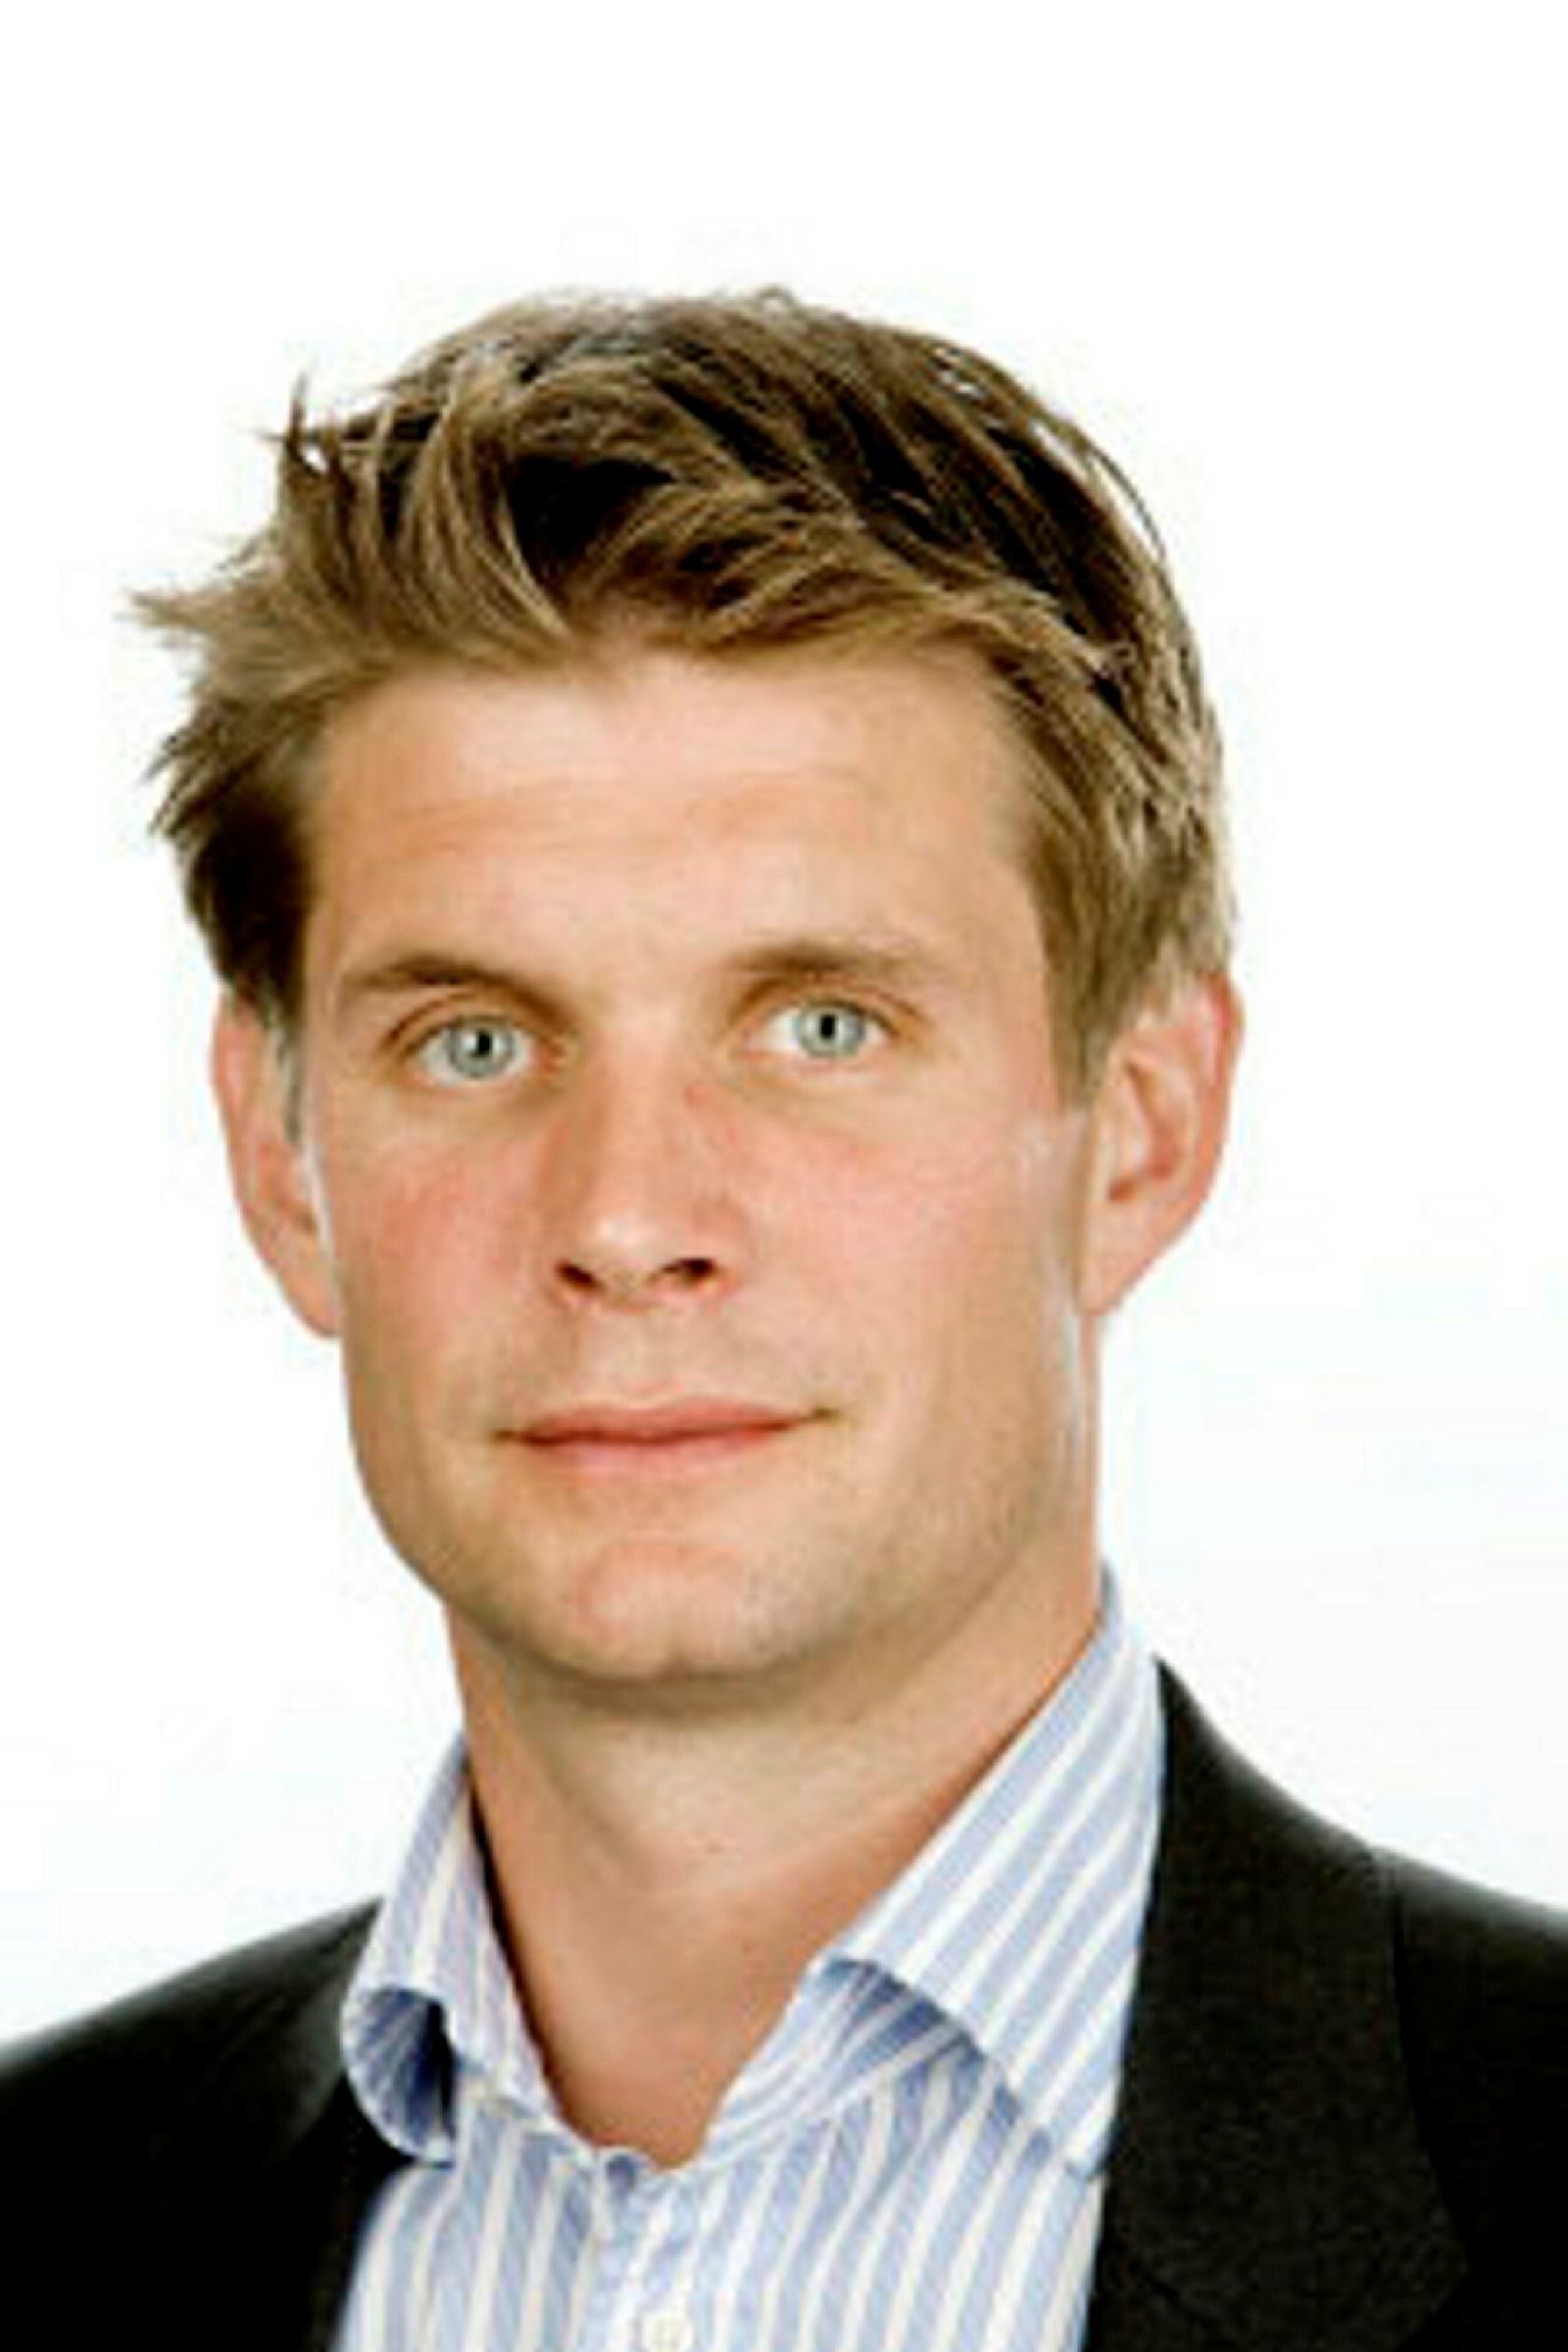 Kommunikasjonssjef Nicolay Bruusgaard i Ringnes.